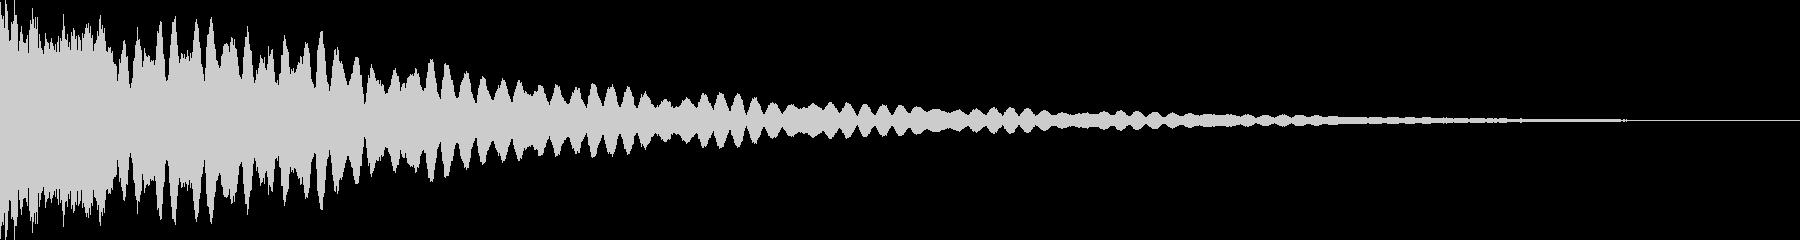 Shaken (reflected sound when receiving one sword)'s unreproduced waveform